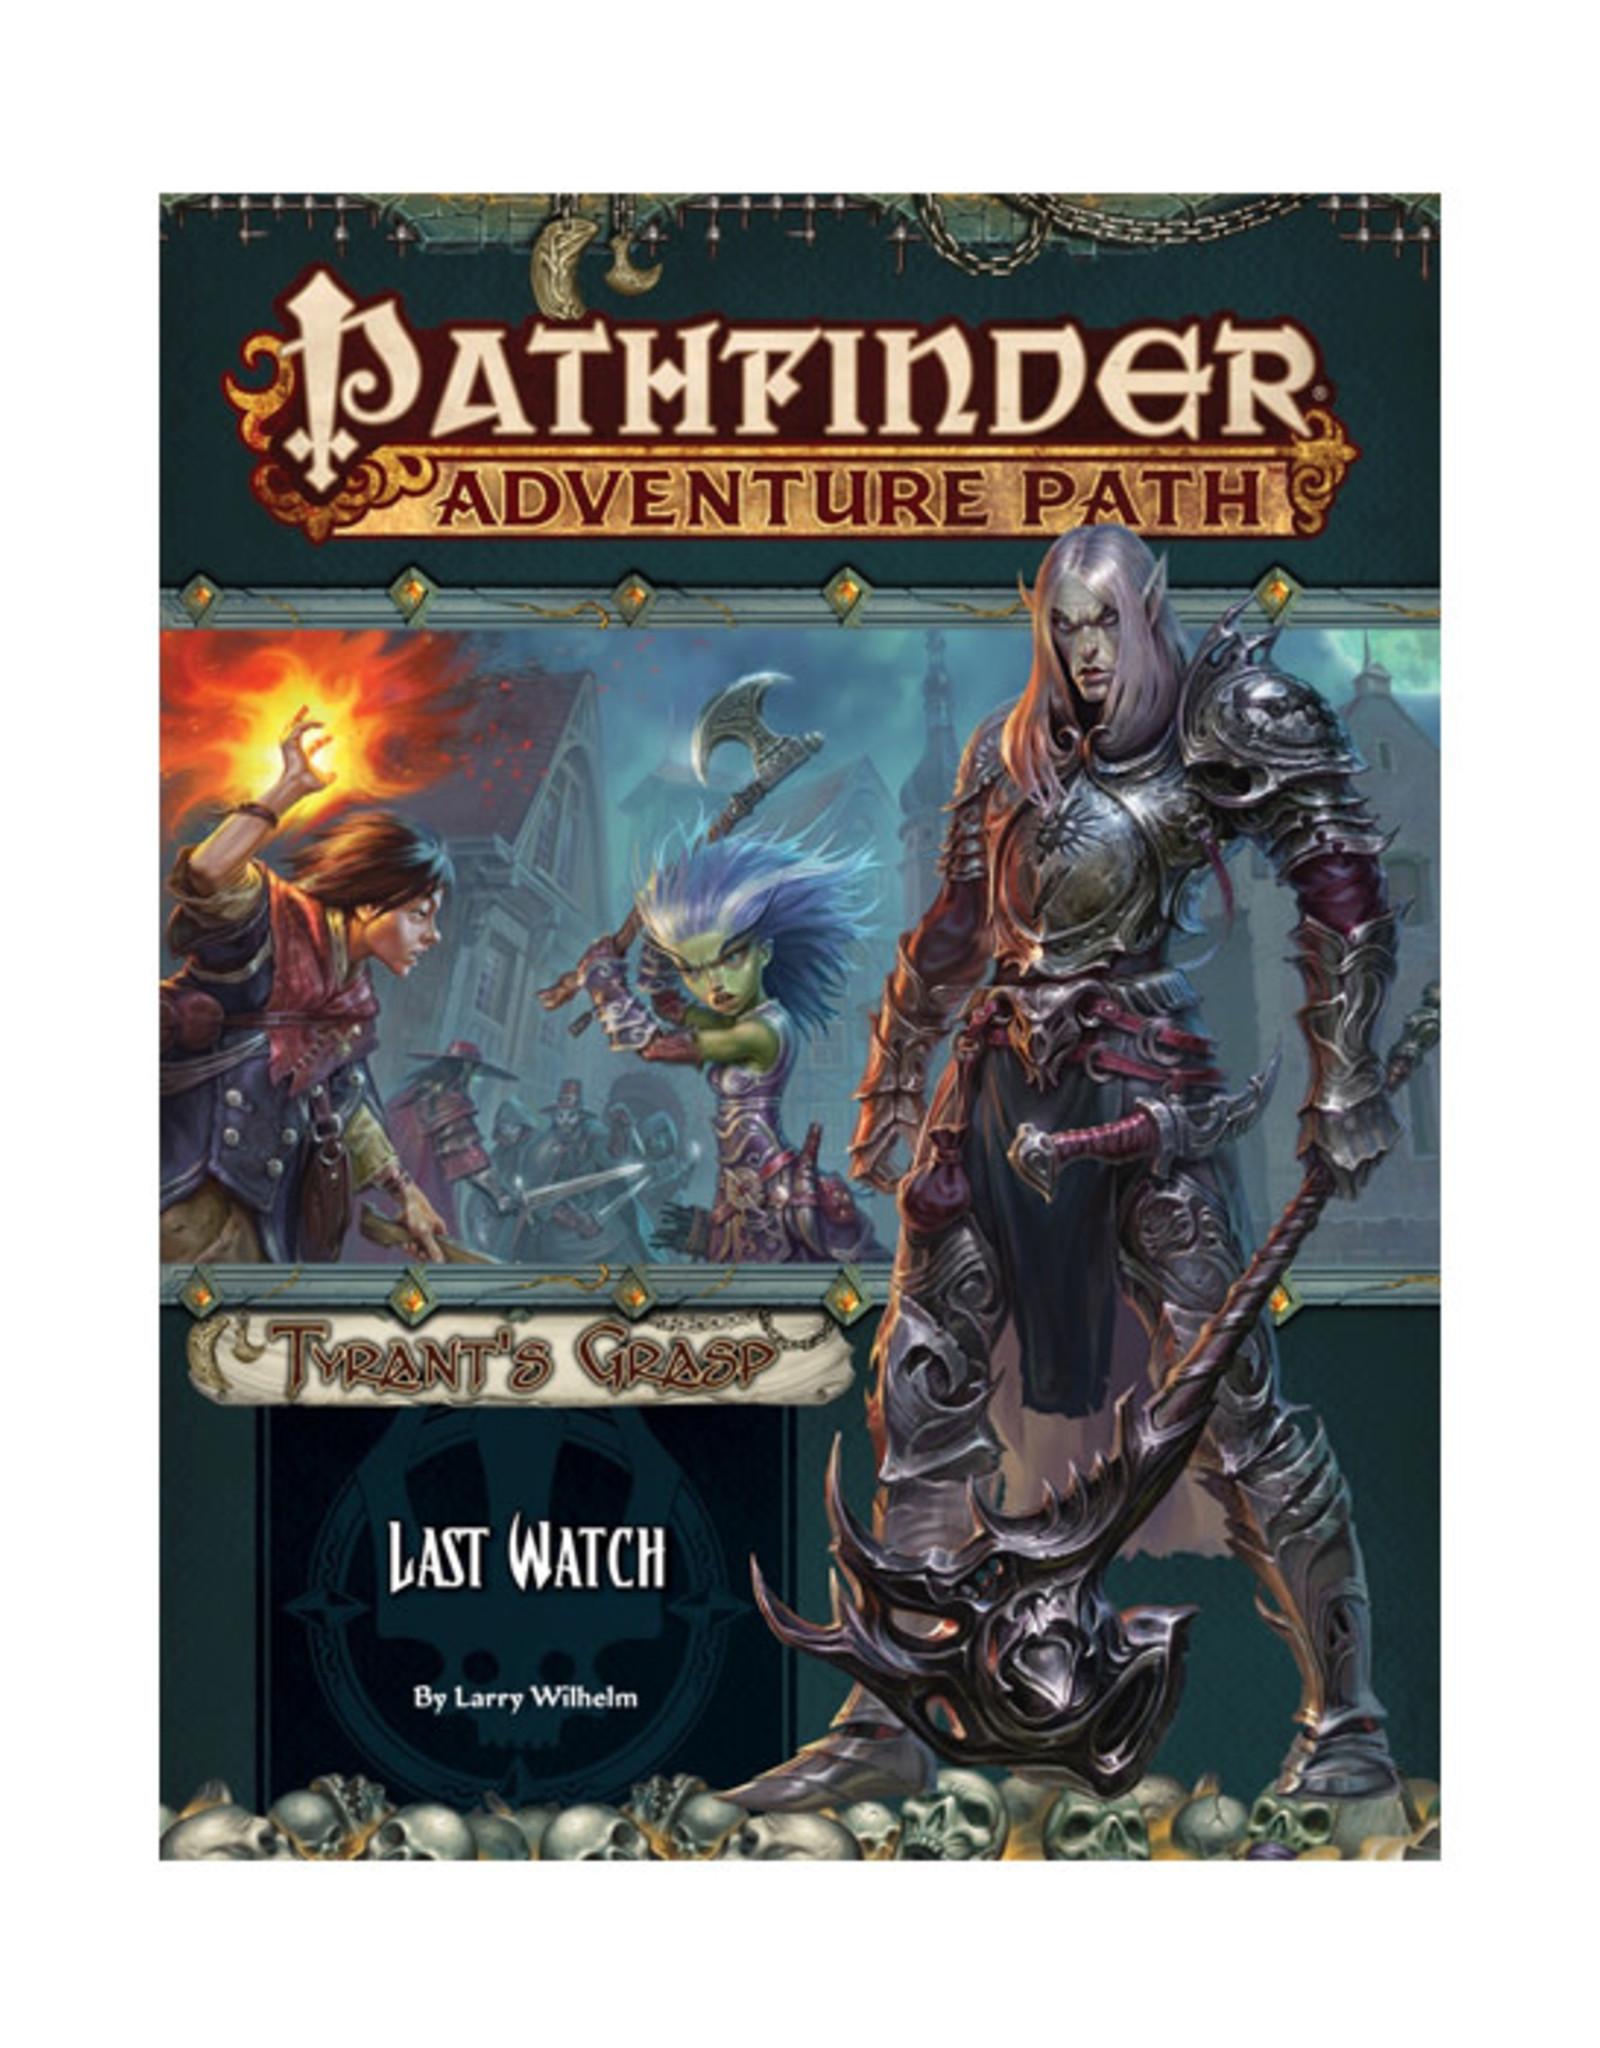 Pathfinder Pathfinder: Adventure Path - Tyrant's Grasp - Last Watch